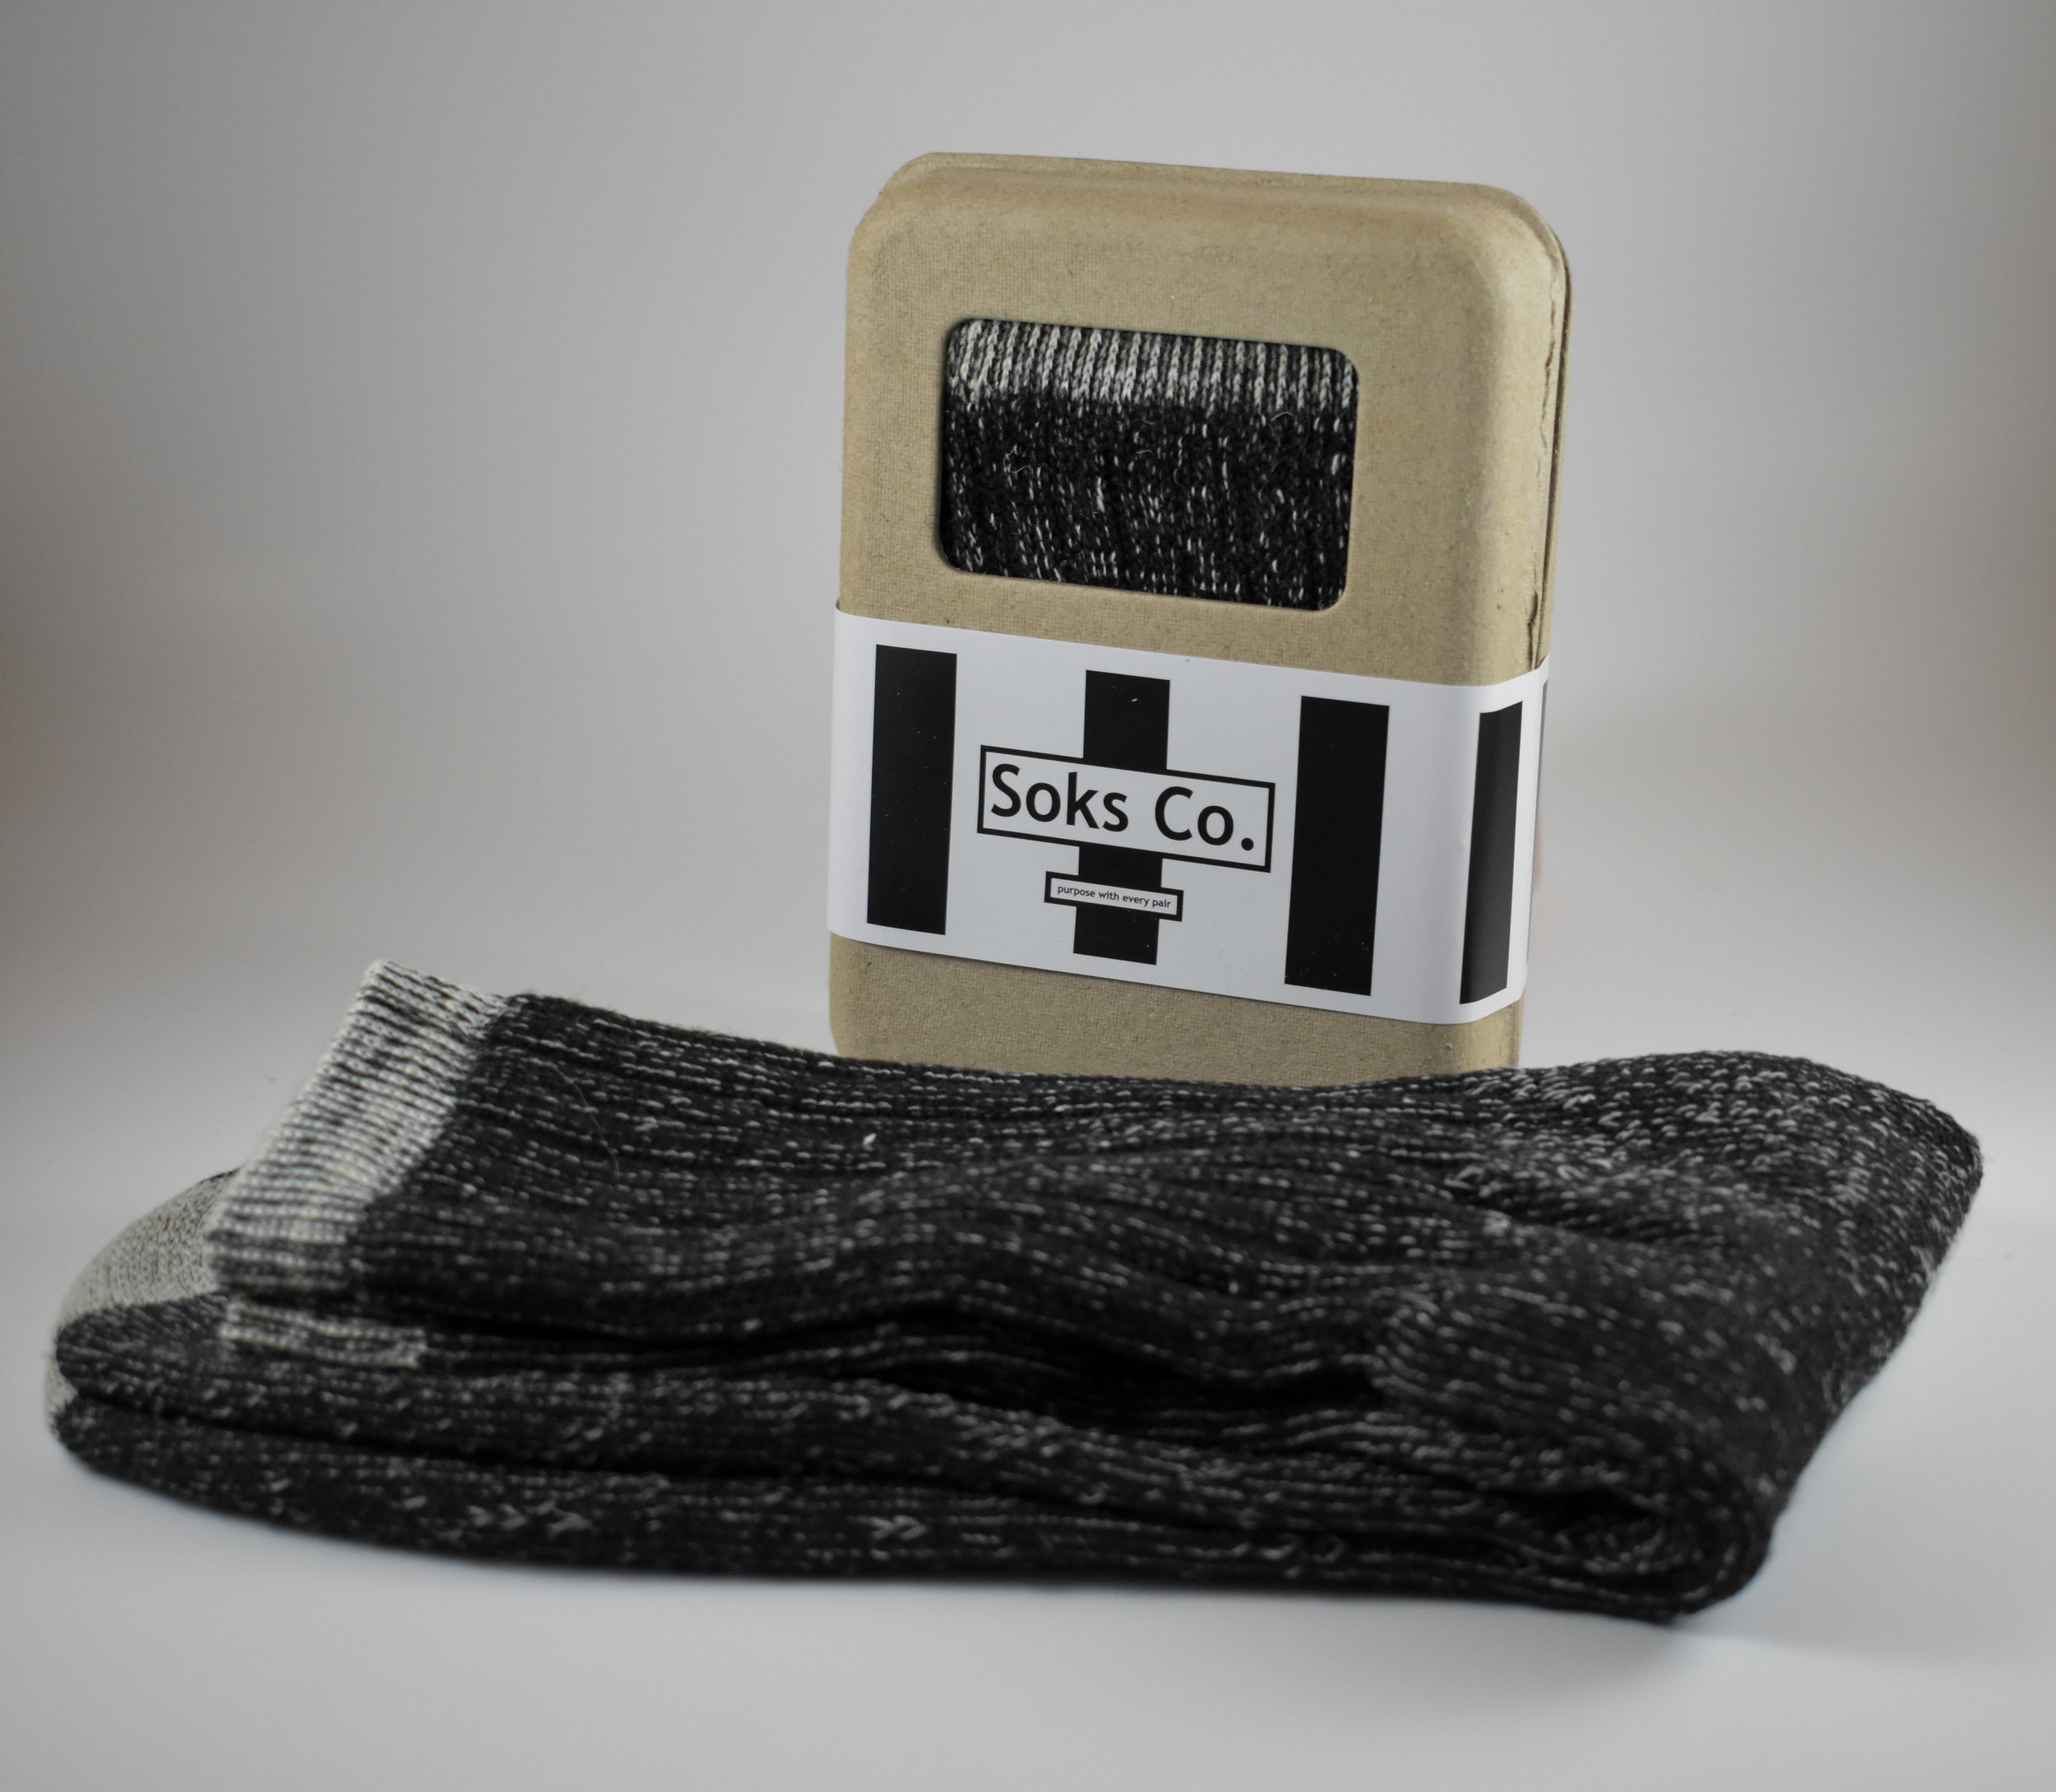 The Original Black Merino Wool Socks. Photo courtesy of Austin Nelson.